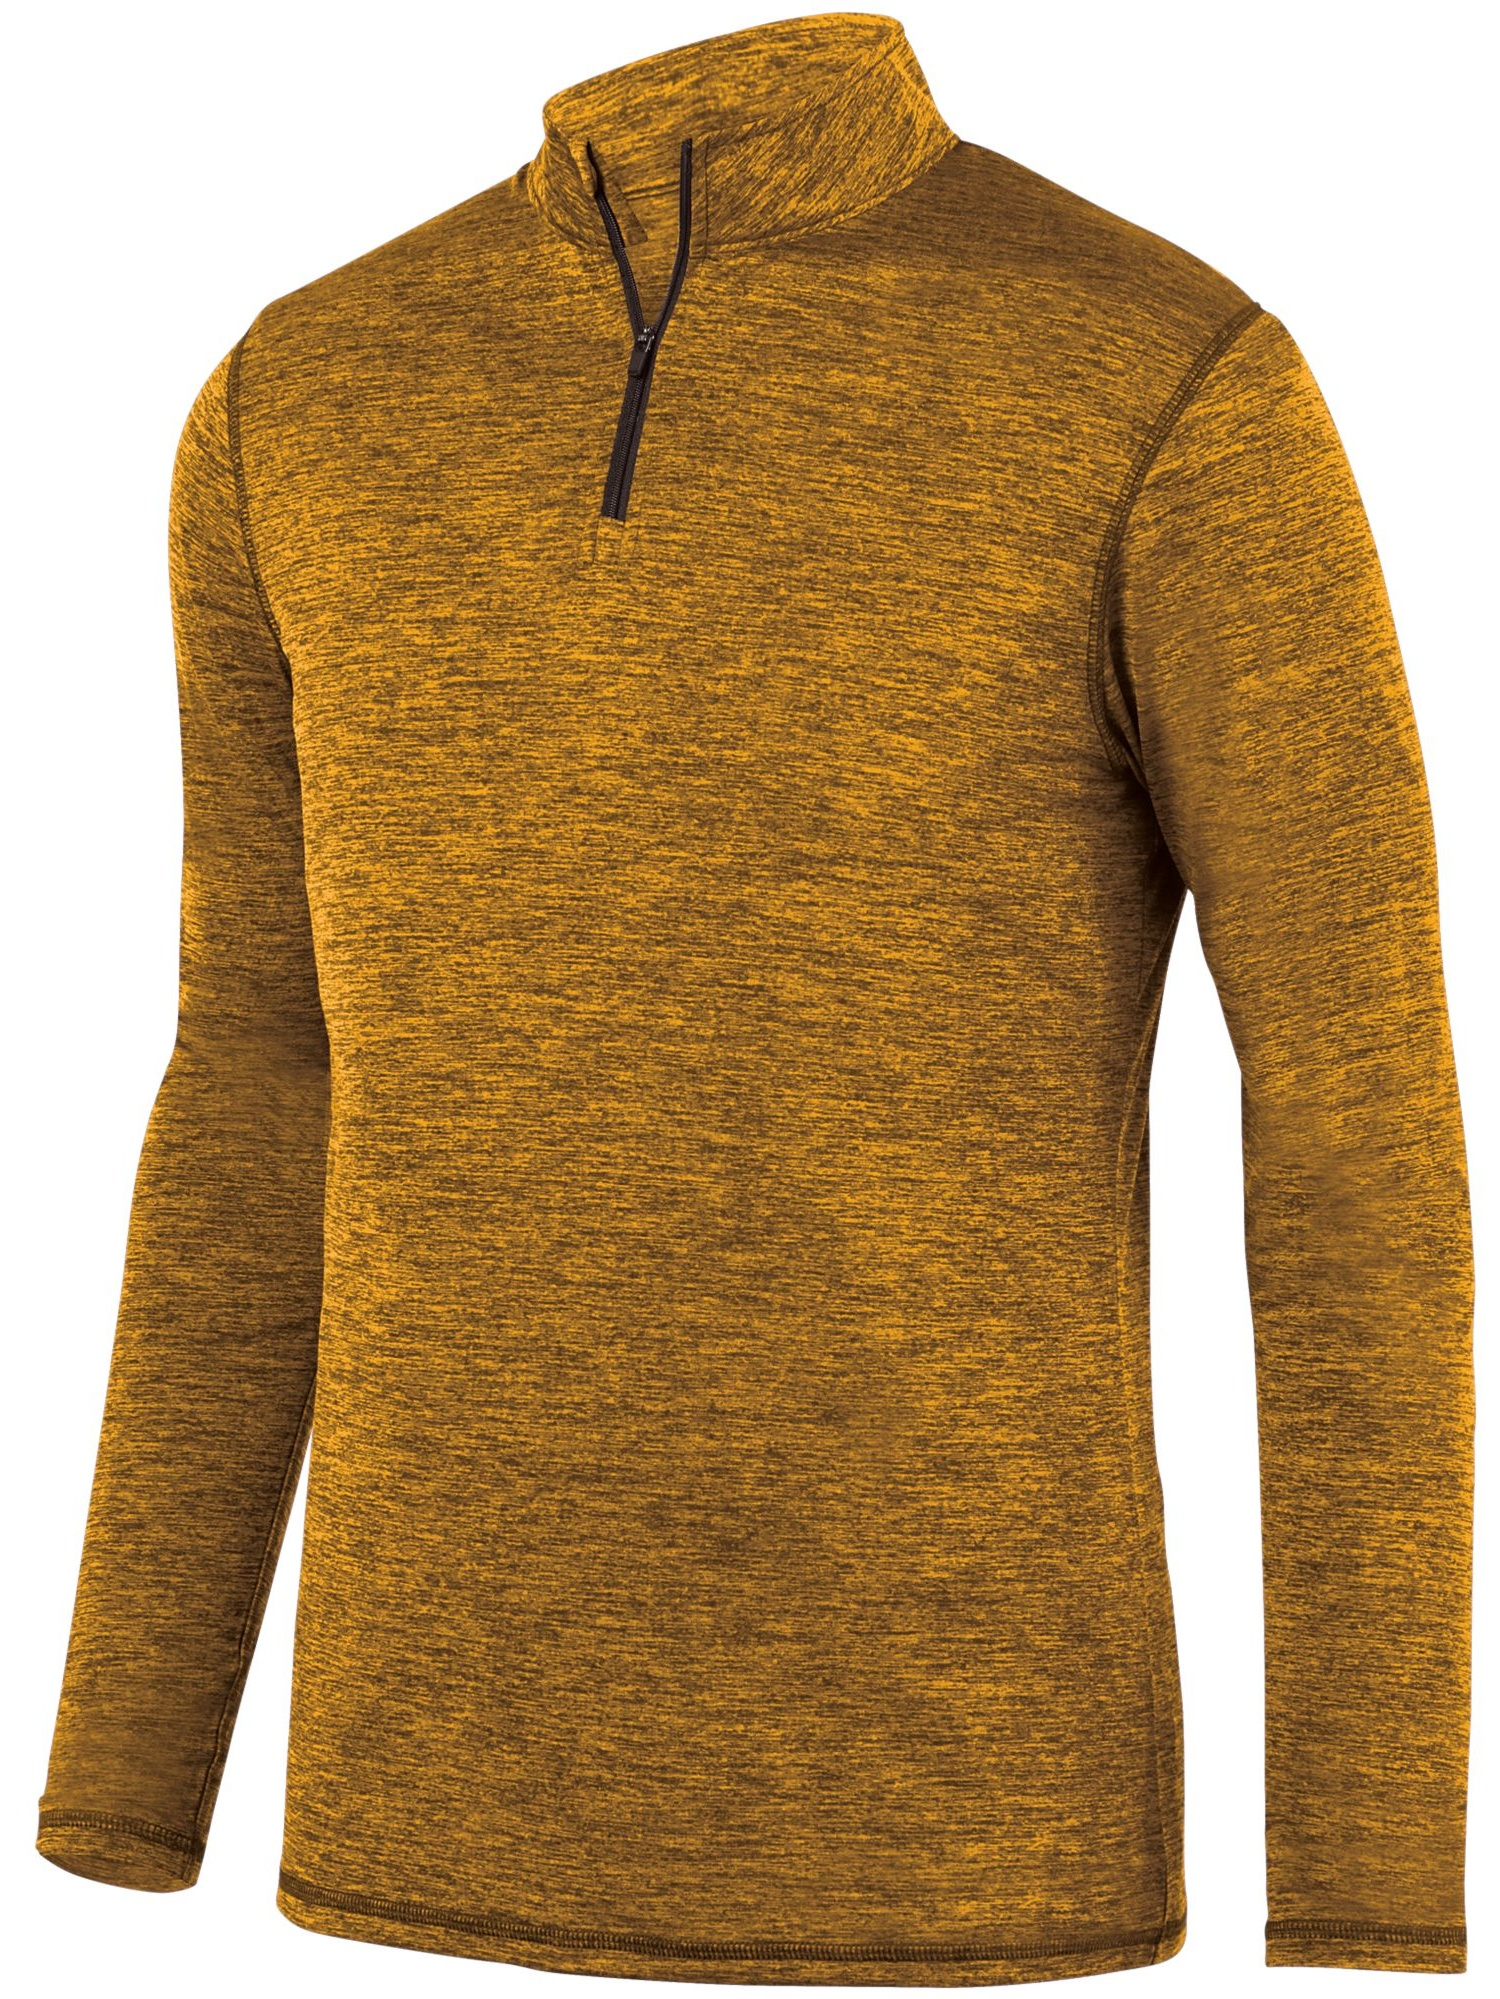 Augusta Sportswear Men's Intensify Black Heather 1/4 Zip Pullover 2955